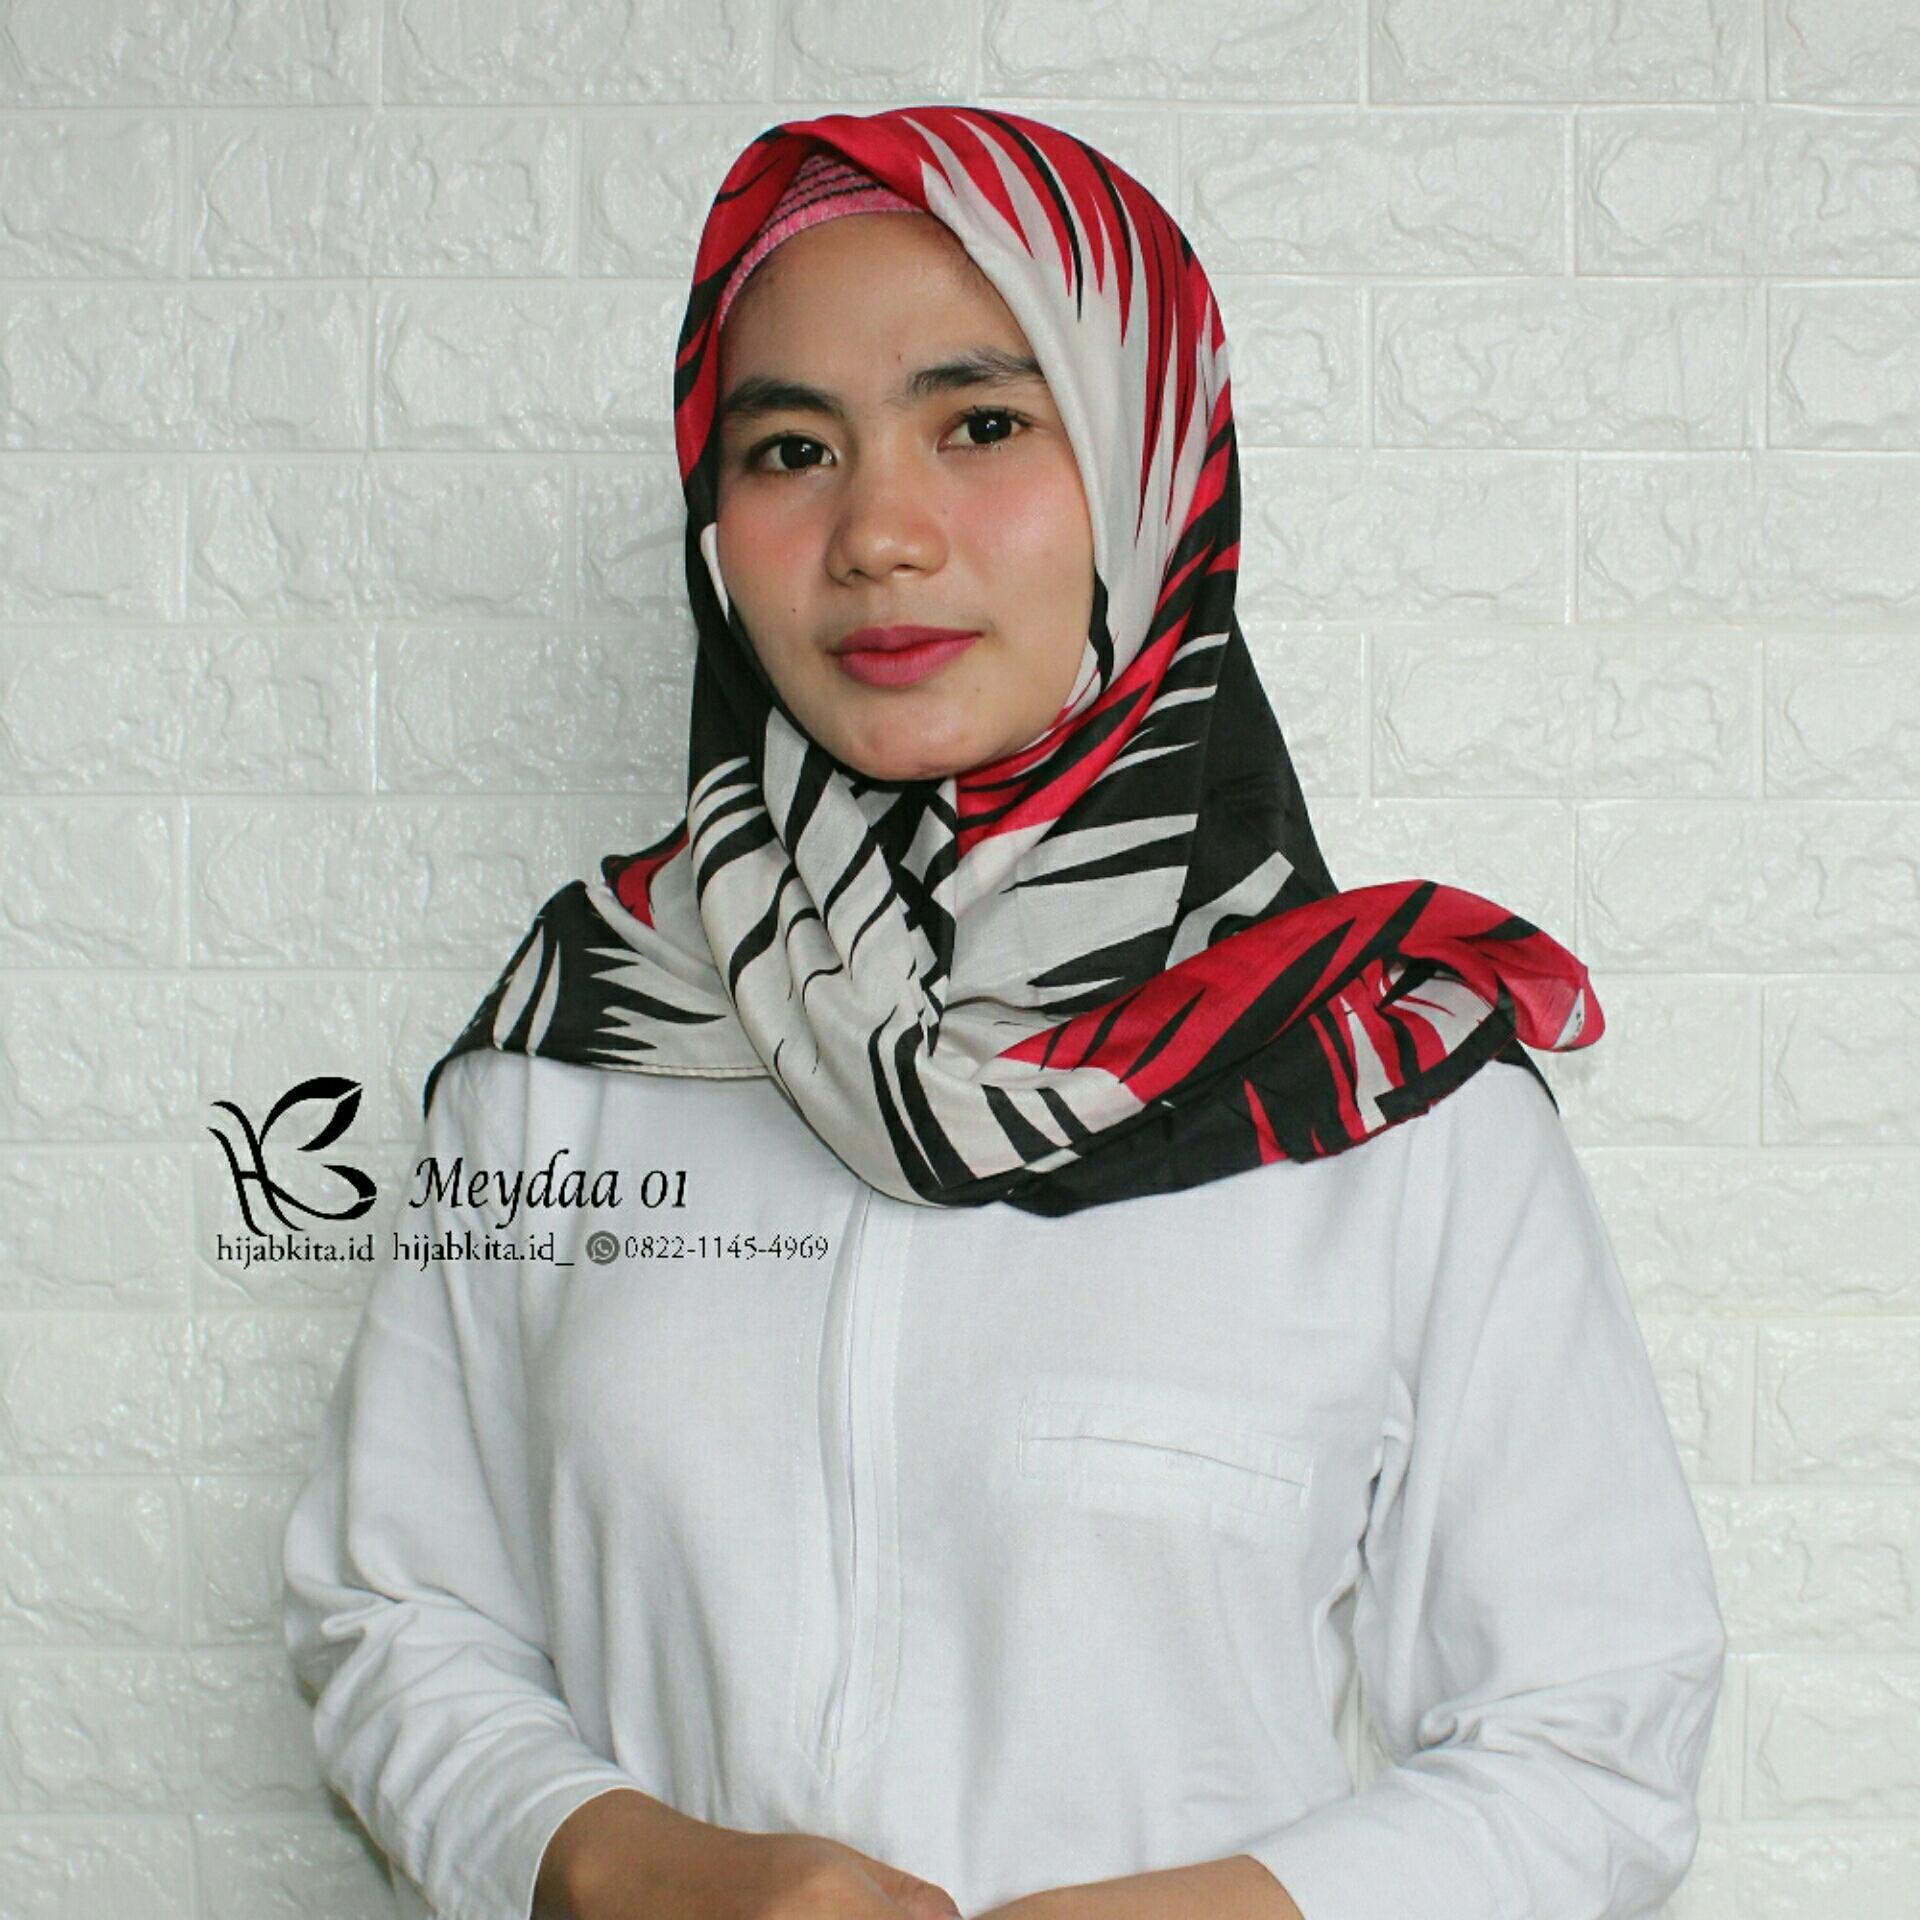 Hijab Segiempat Umama Motif Coklat Daftar Harga Terkini Dan Eclemix Jilbab Cornskin 1 Scarf Square Segi Empat Cokelat Muda